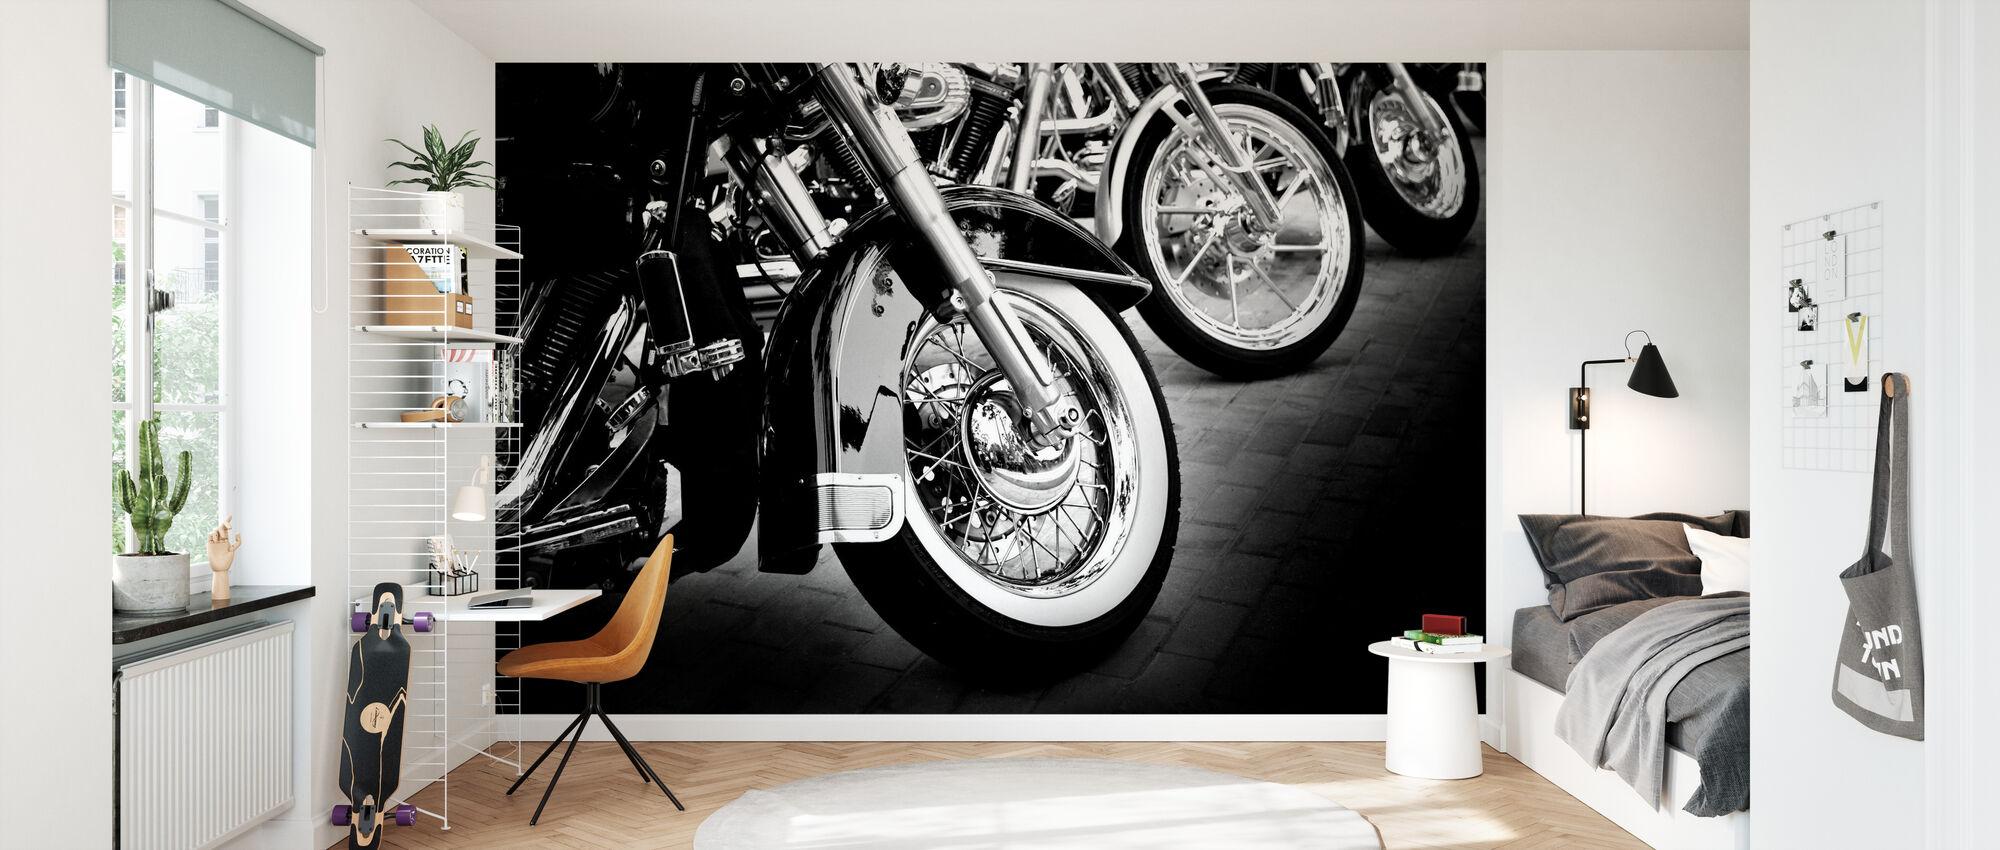 Bikes in a Row - Wallpaper - Kids Room